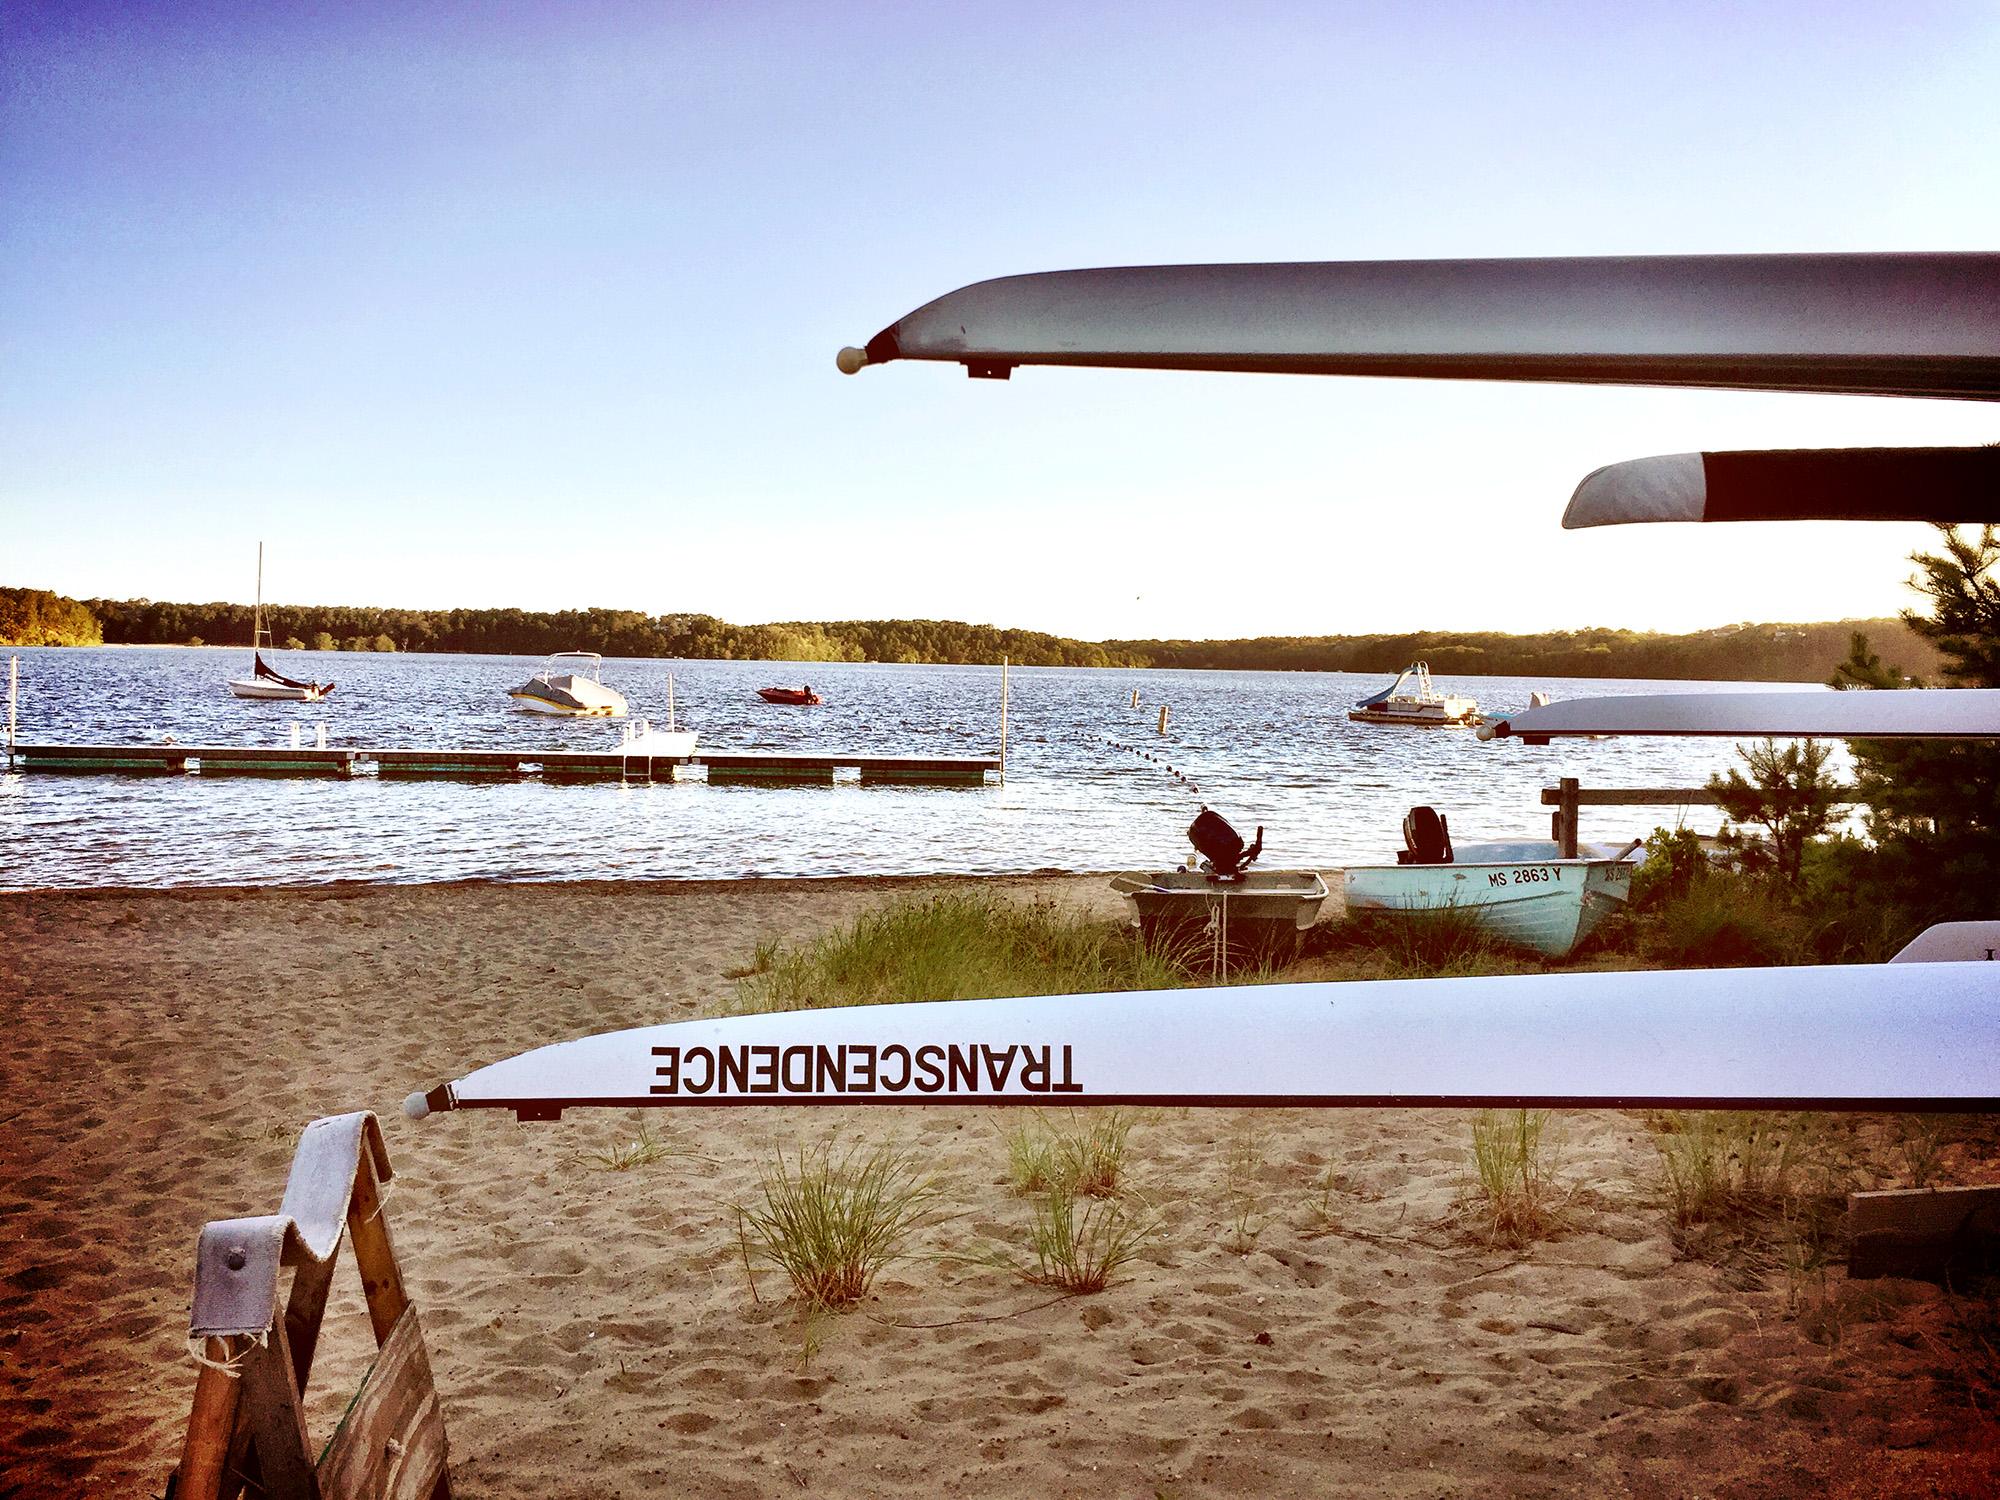 boats-on-beach-transcendence